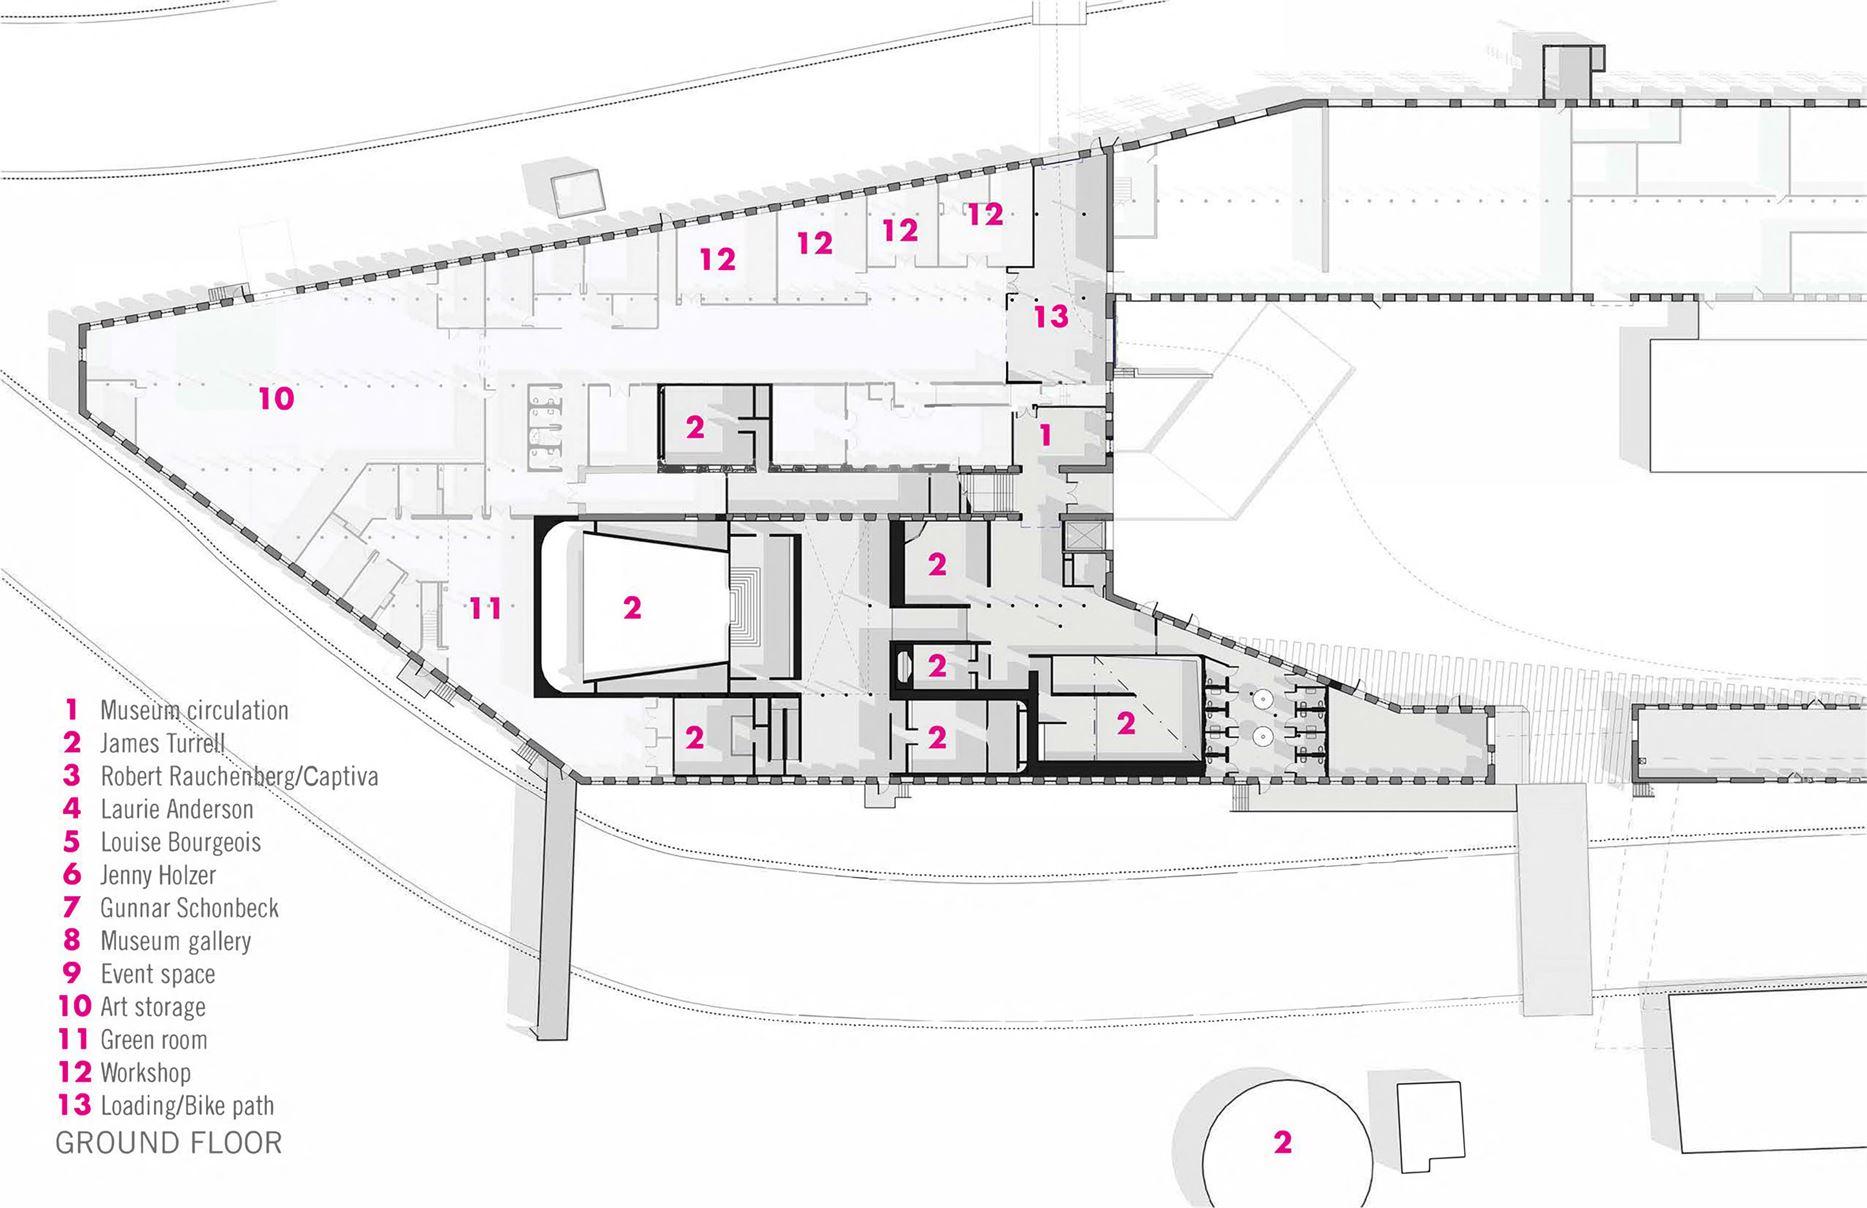 floor-plan-bruner-cott-mass-moca-massachusetts-museum-of-contemporary-art-museum-textile-factory-berkshires-expansion-renovation_de